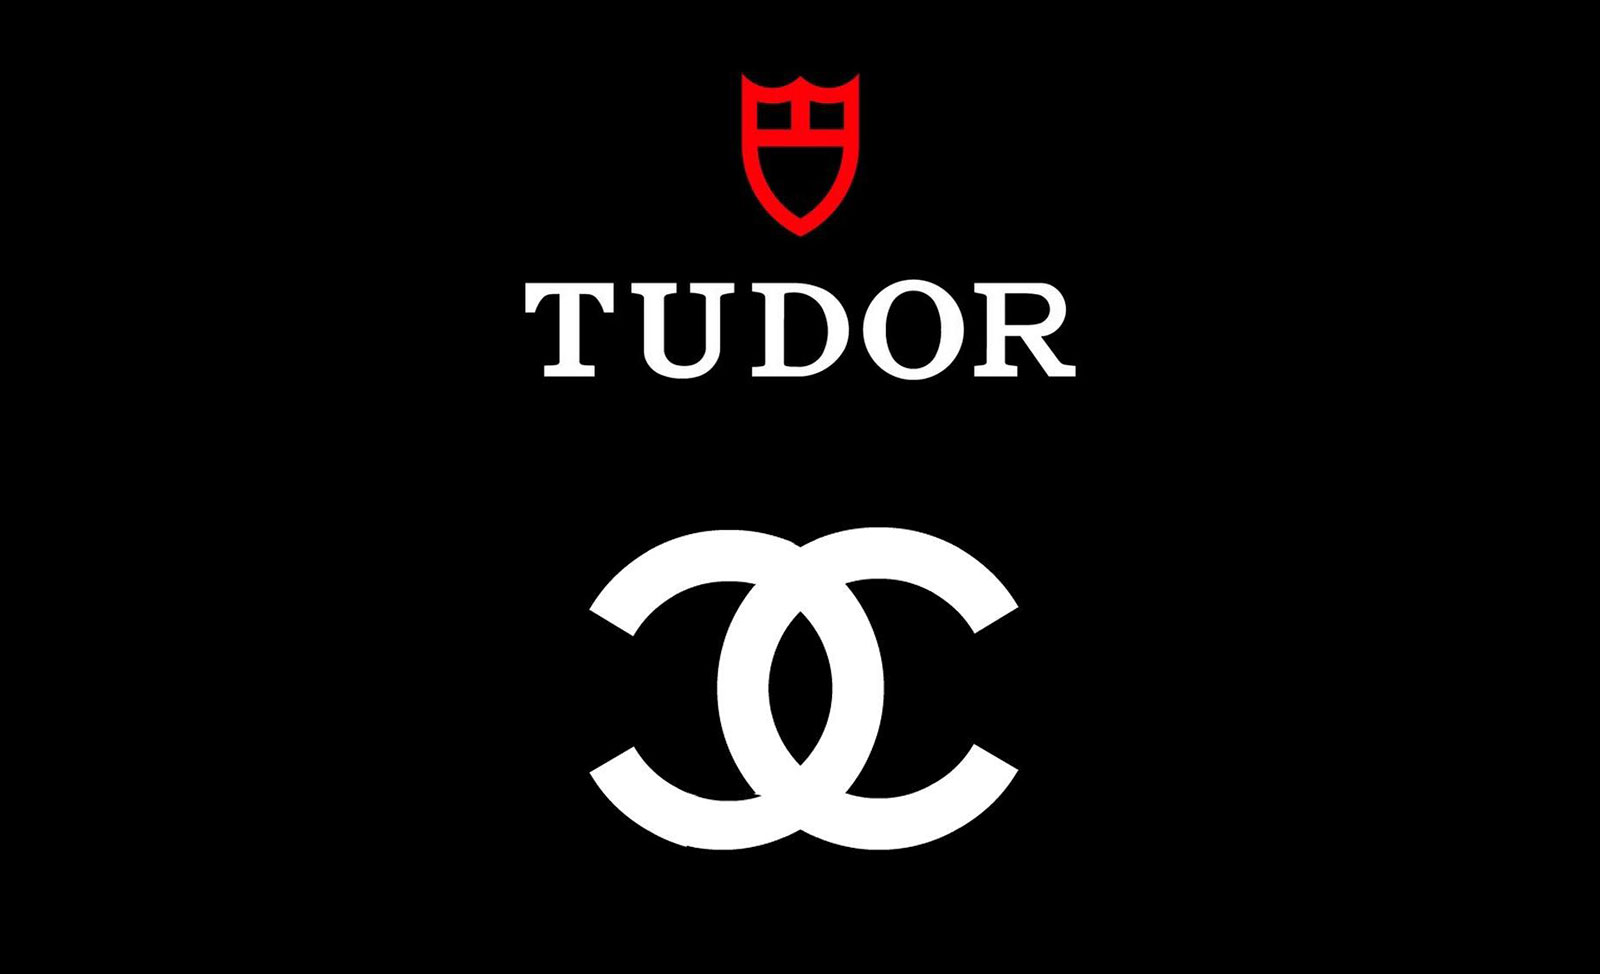 Tudor Chanel Kenissi